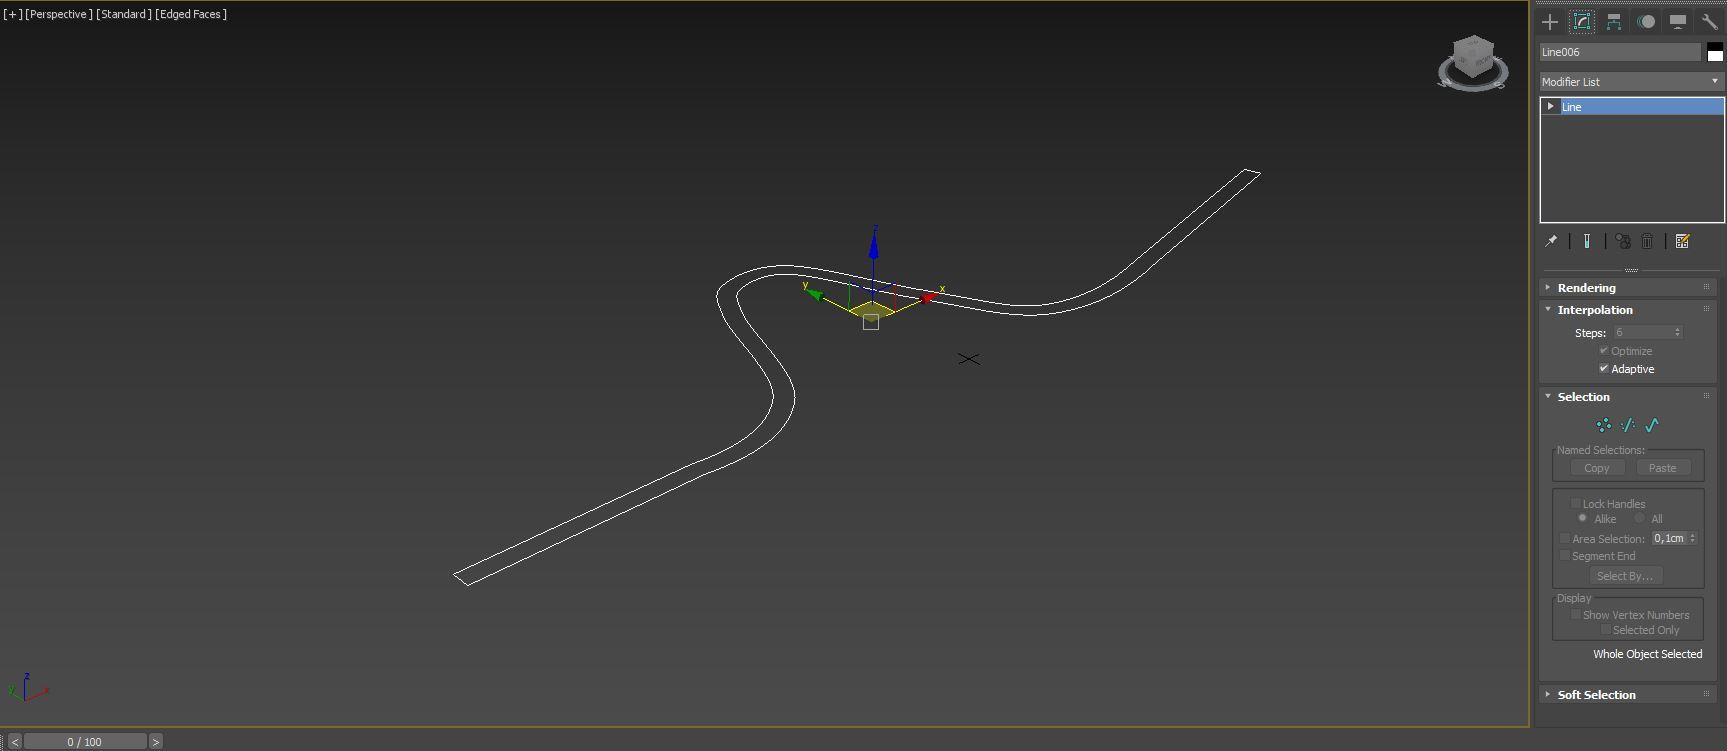 Line_03.JPG.c6bd8442d4dc2c4a41e2f2ba35403f90.JPG